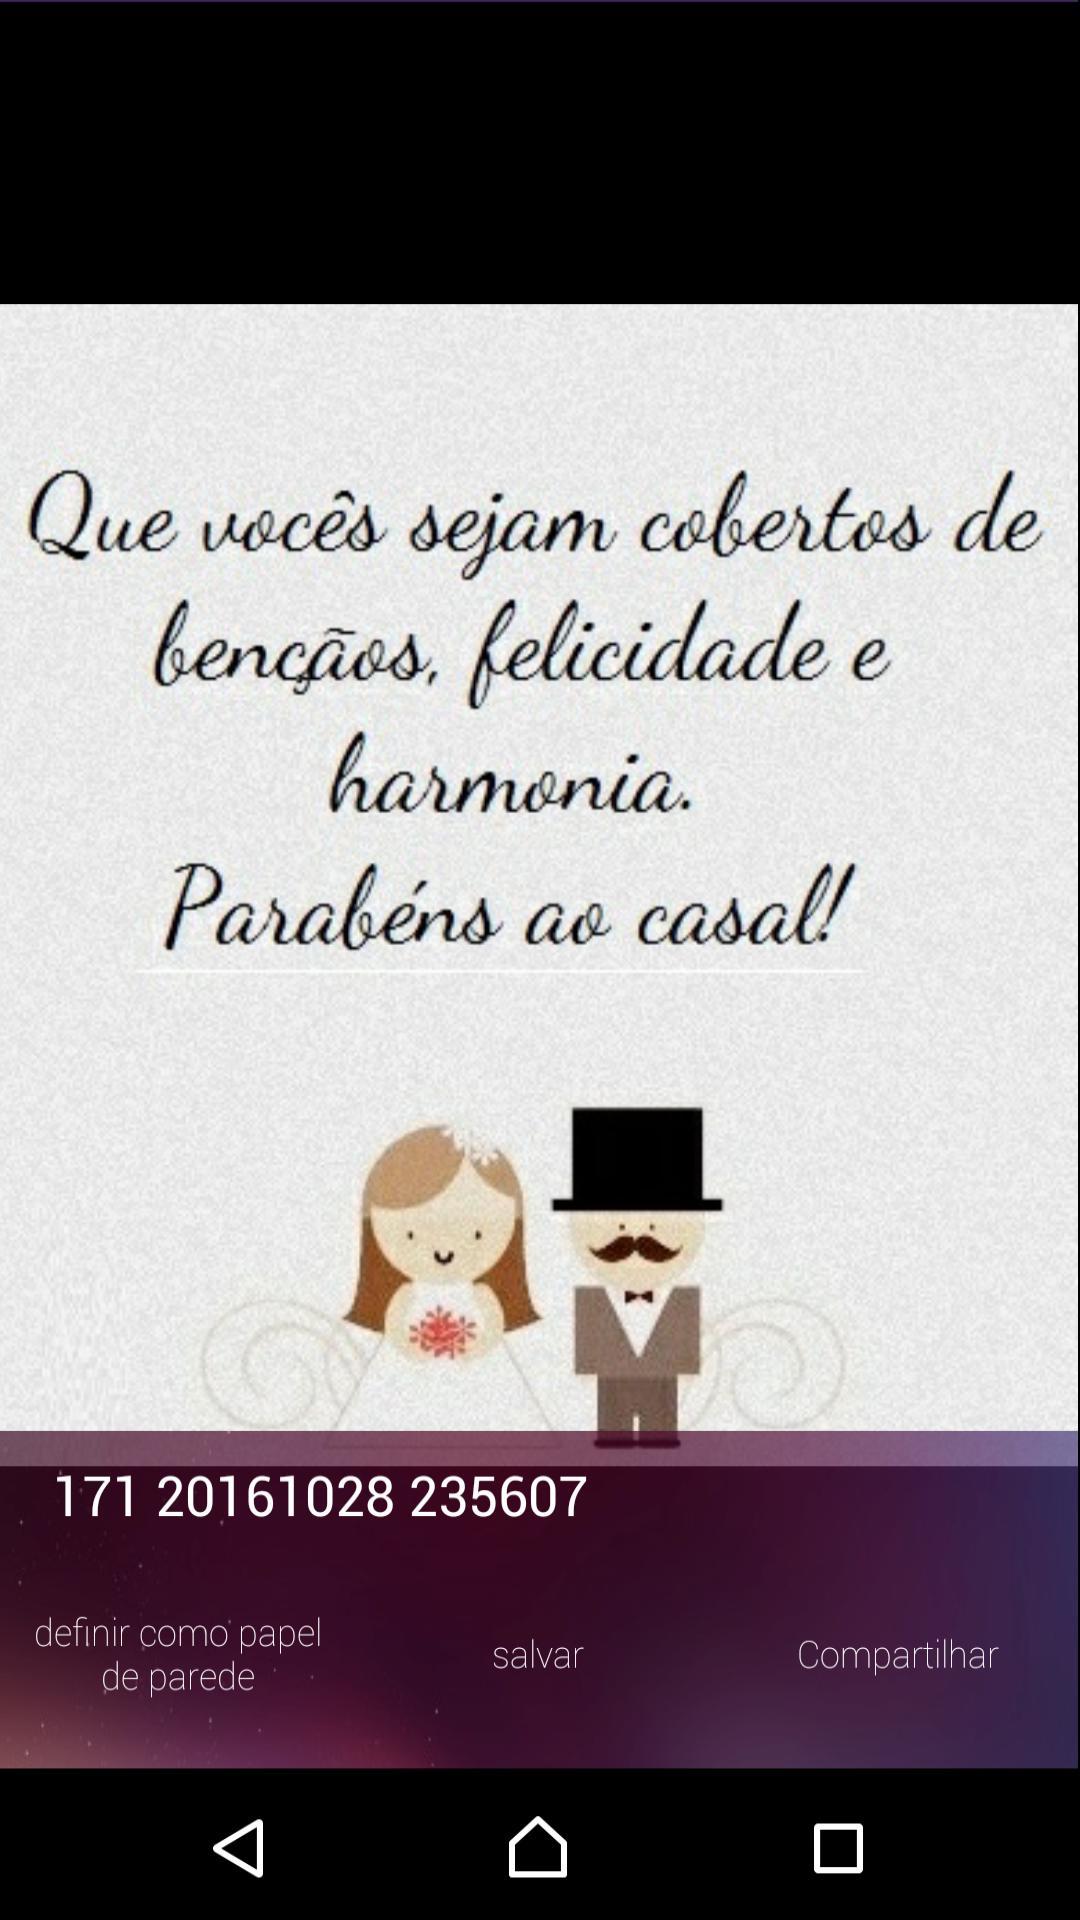 Frases De Casamento For Android Apk Download